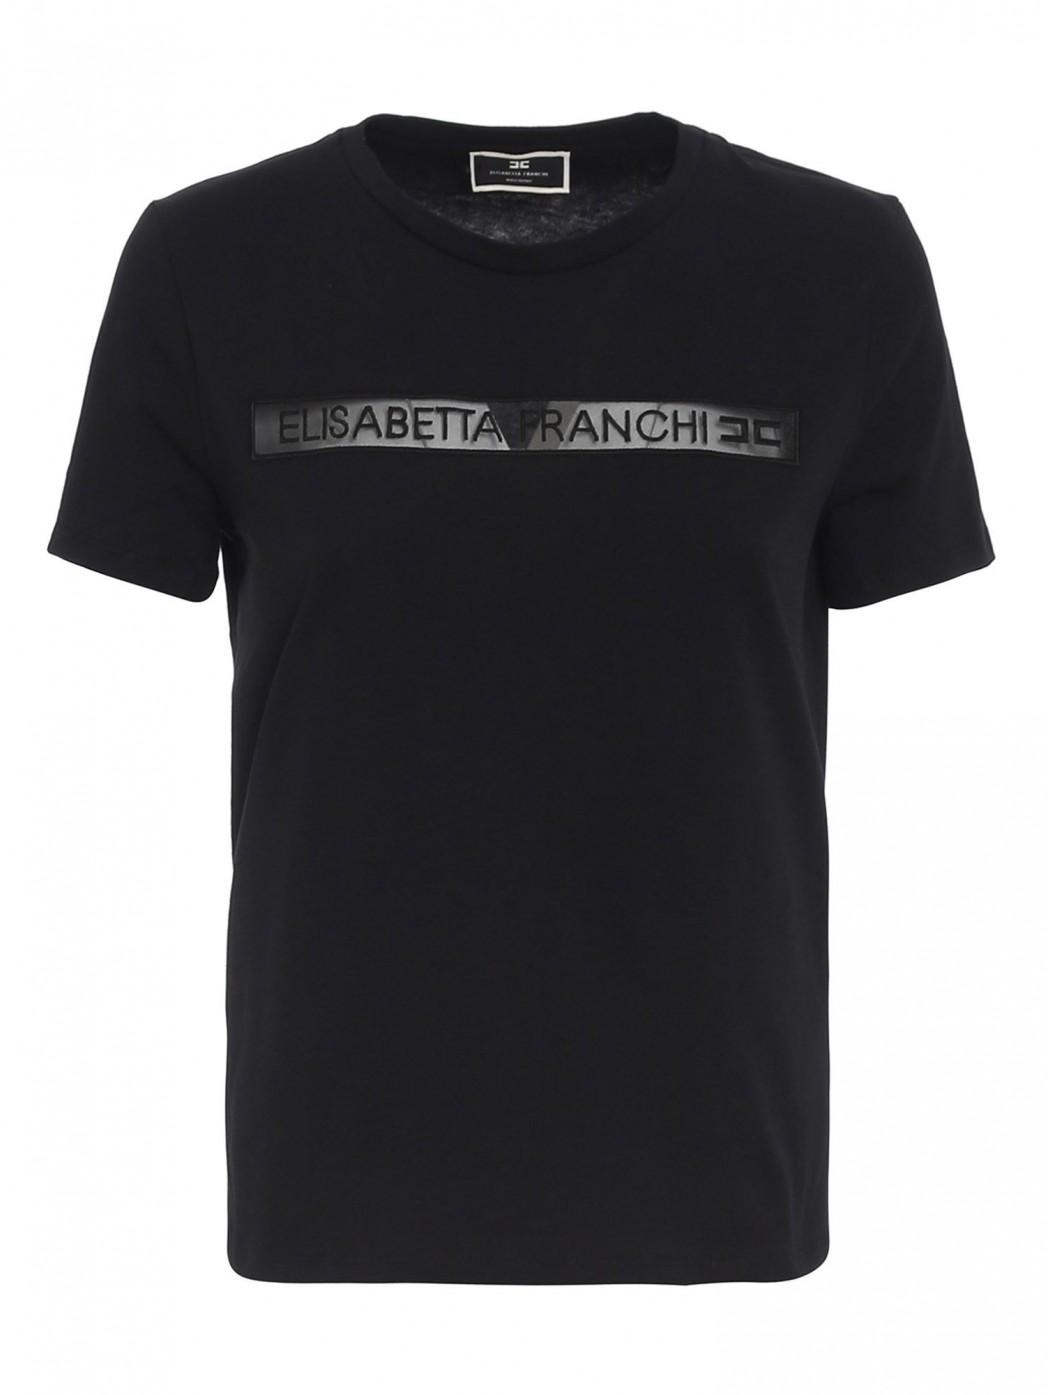 T-shirt Elisabetta Franchi con stampa ELISABETTA  FRANCHI MA18411E2 110